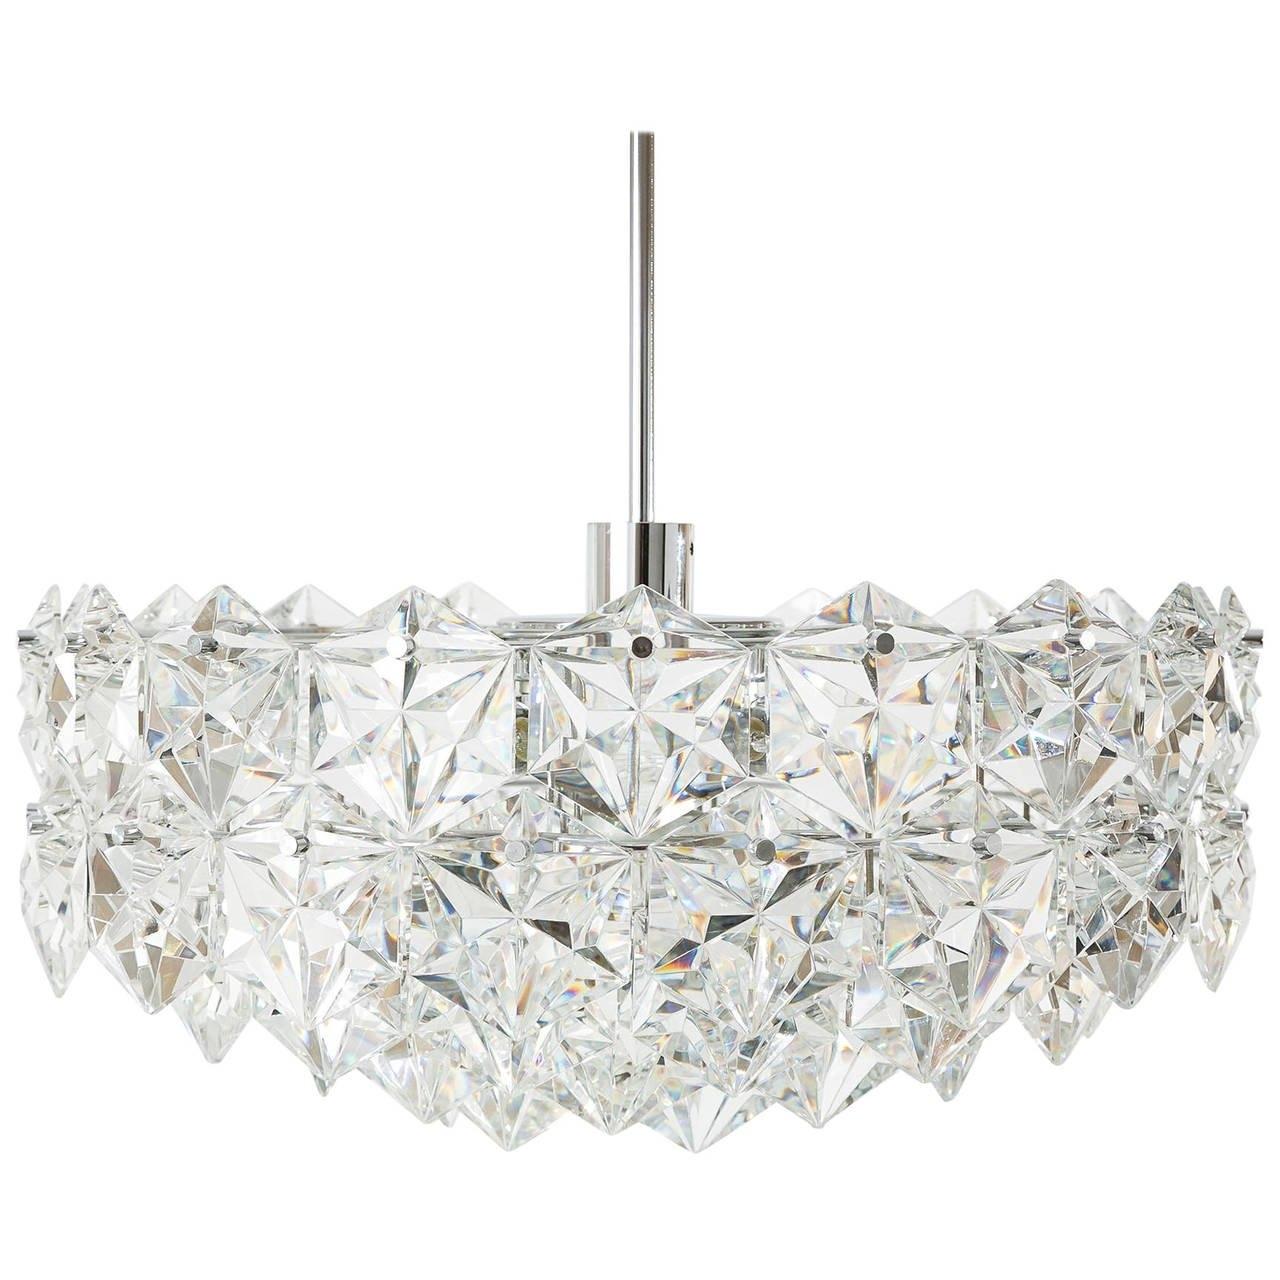 19 3 Tier Kinkeldey Crystal Chandelier Flush Mount Light Chrome Pertaining To 3 Tier Crystal Chandelier (View 10 of 15)